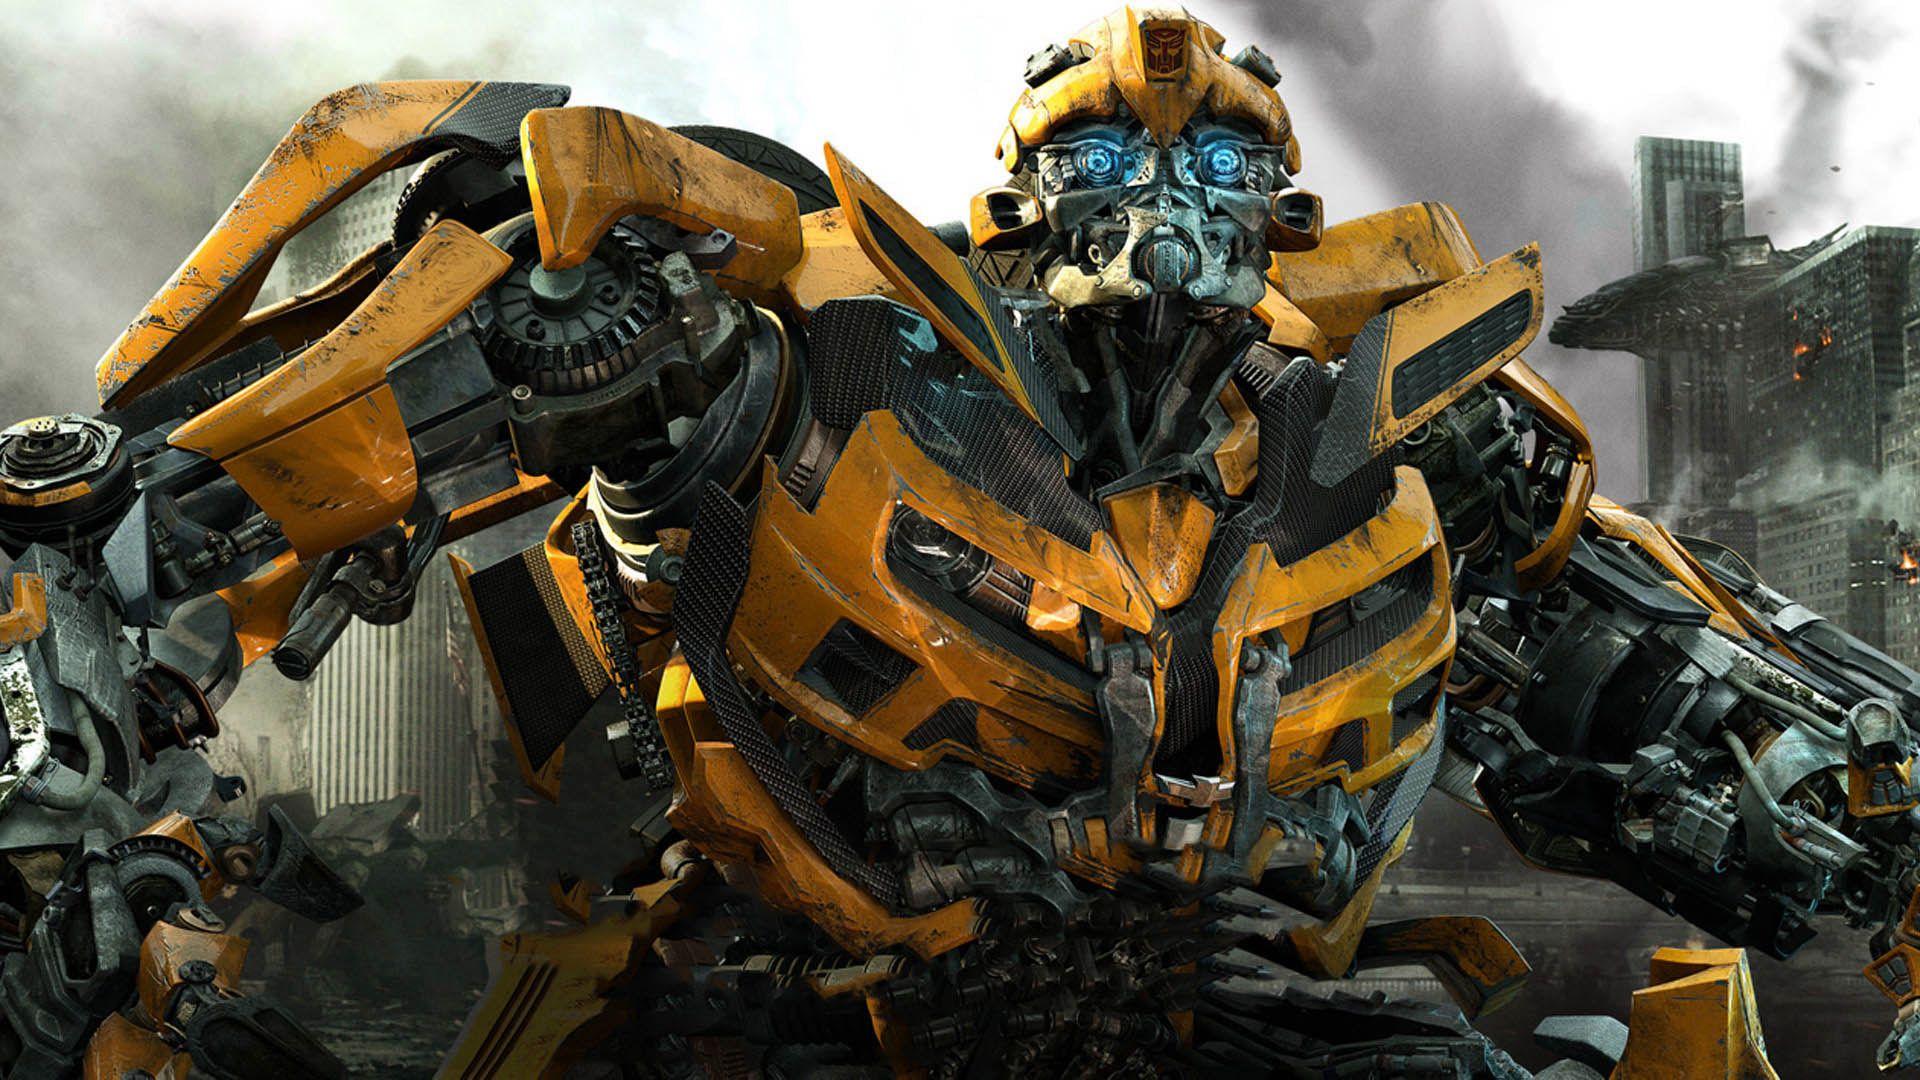 transformers-3-dark-of-the-moon.jpg